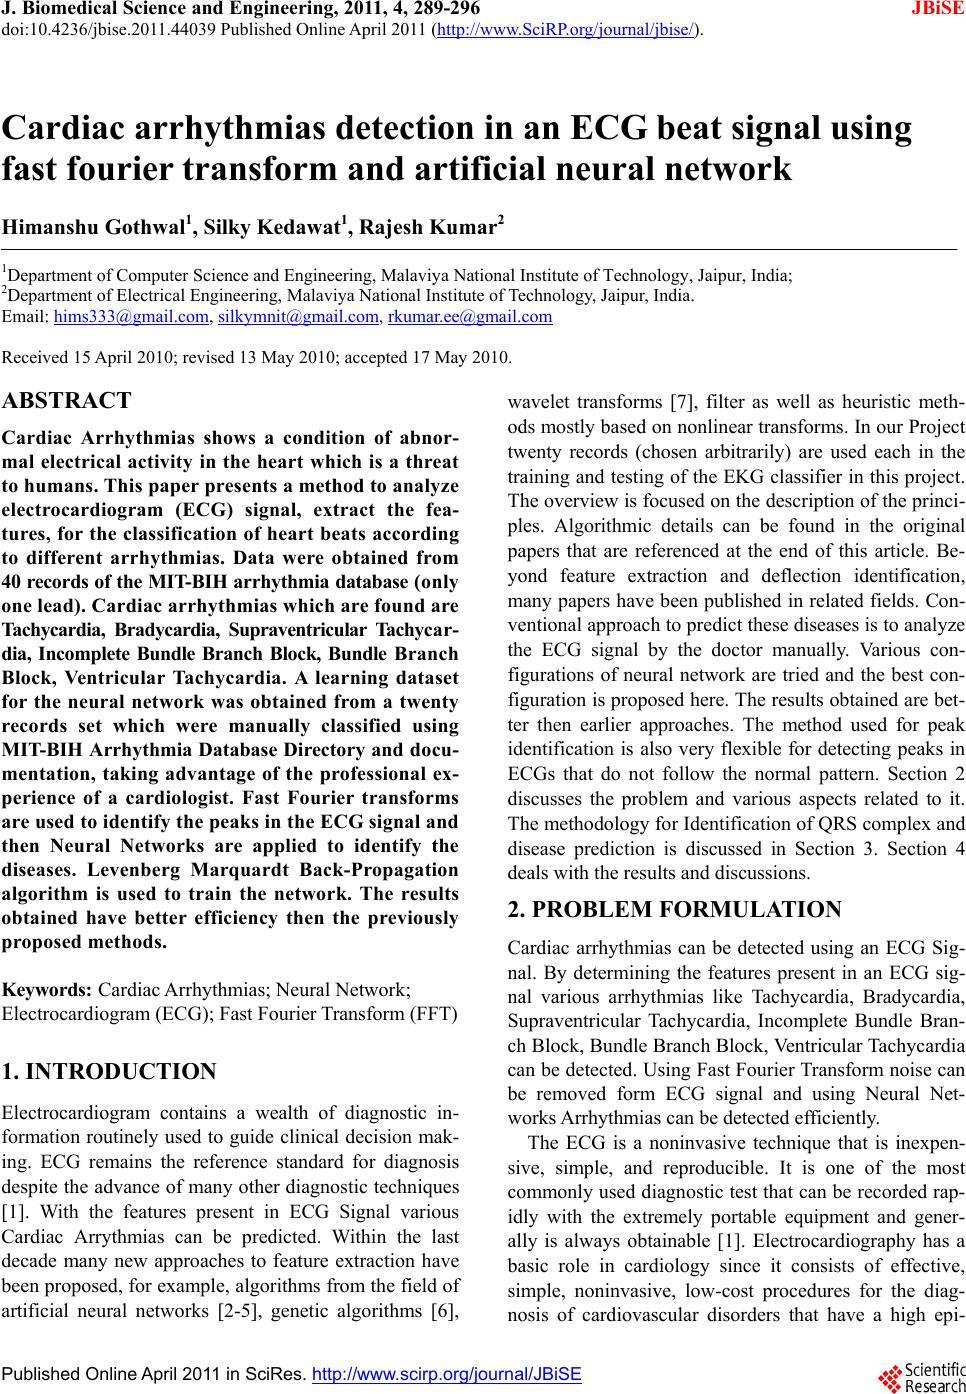 Cardiac arrhythmias detection in an ECG beat signal using